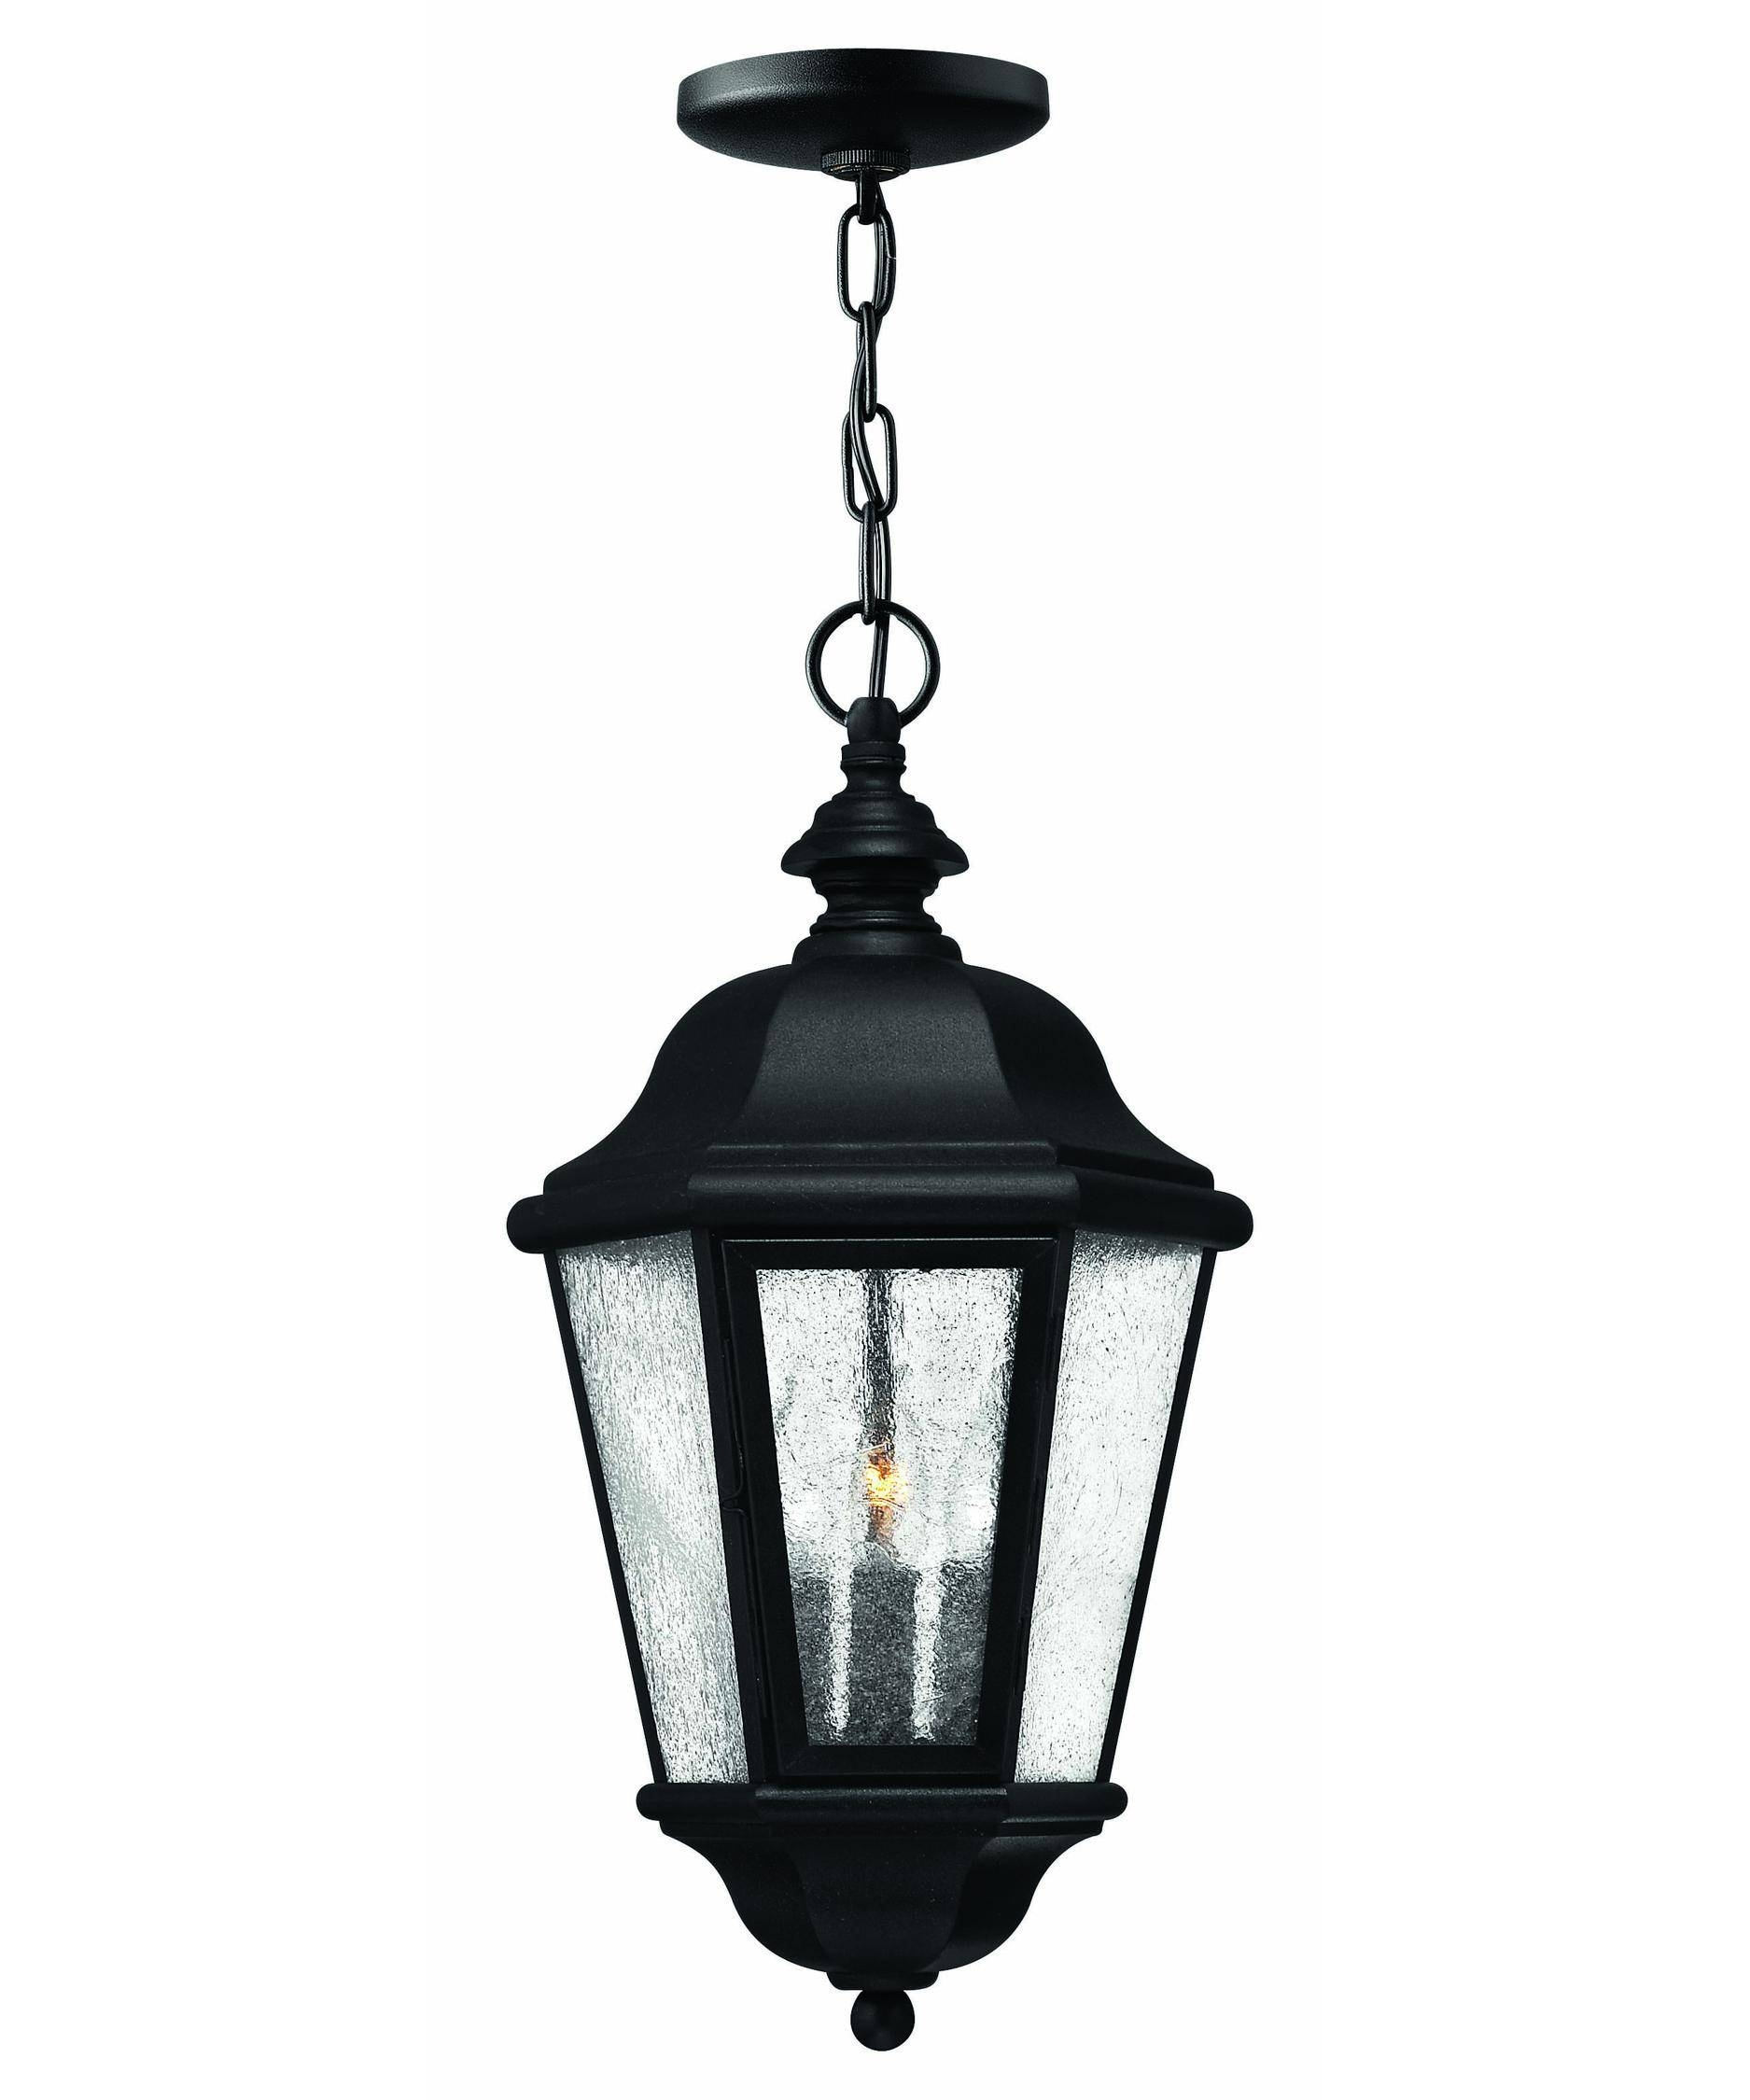 Hinkley Lighting 1672 Edgewater 10 Inch Wide 3 Light Outdoor regarding Outside Pendant Lights (Image 3 of 15)